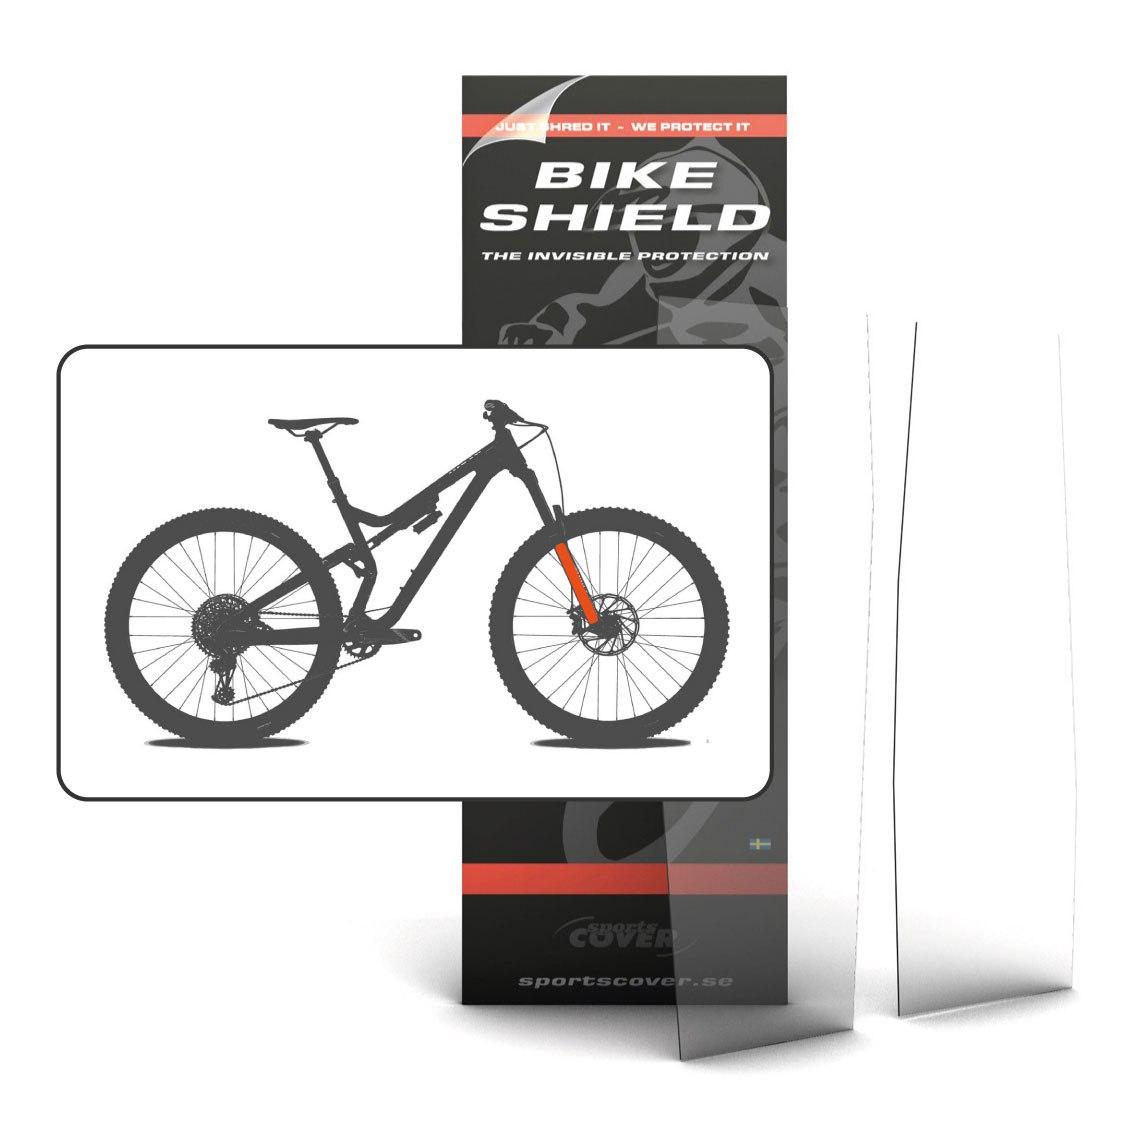 BikeShield ForkShield Cover - 2 pieces - standard